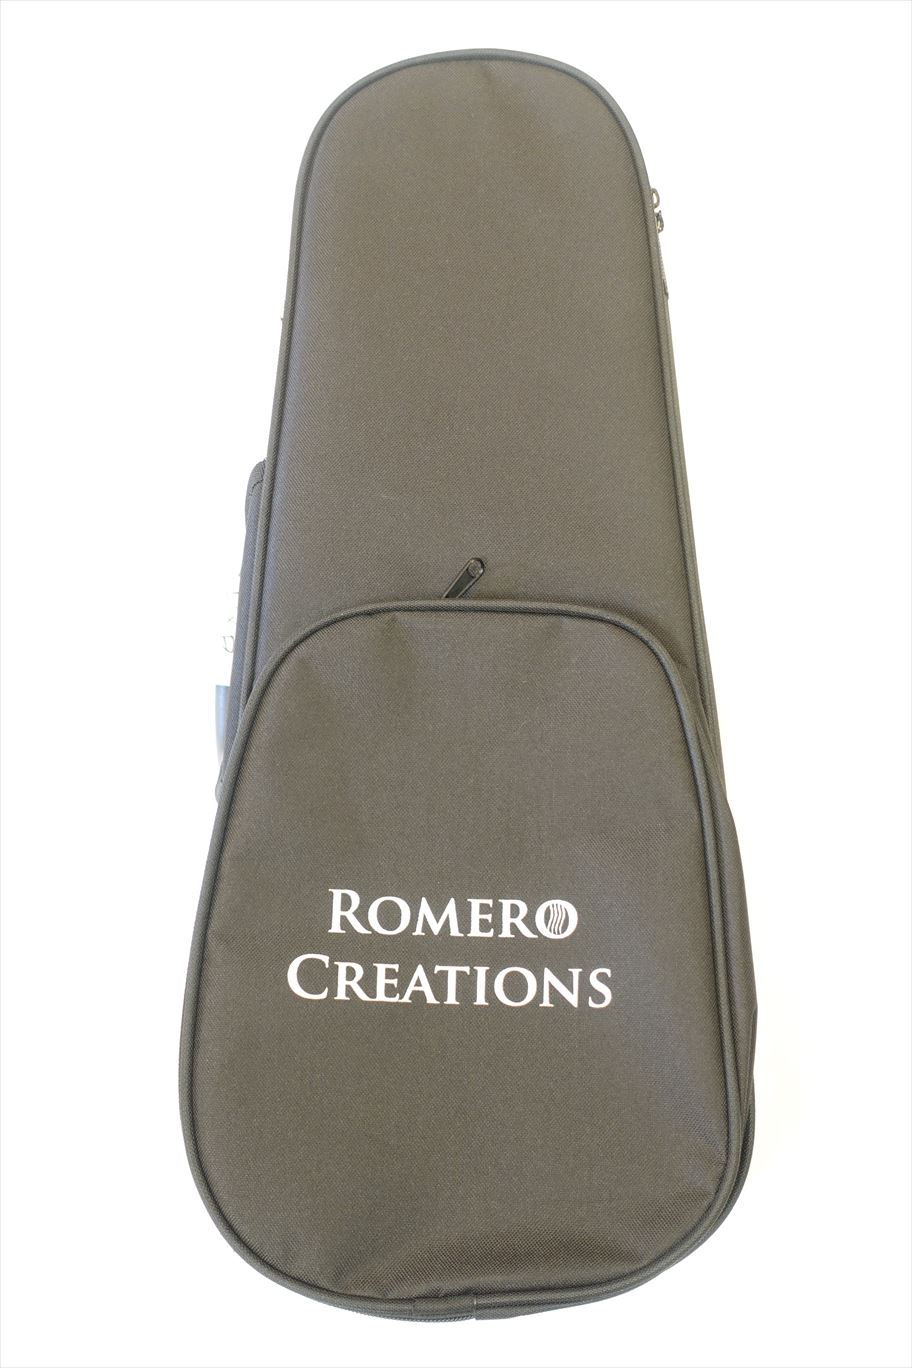 【Romero Creations】XS Soprano Premium Koa